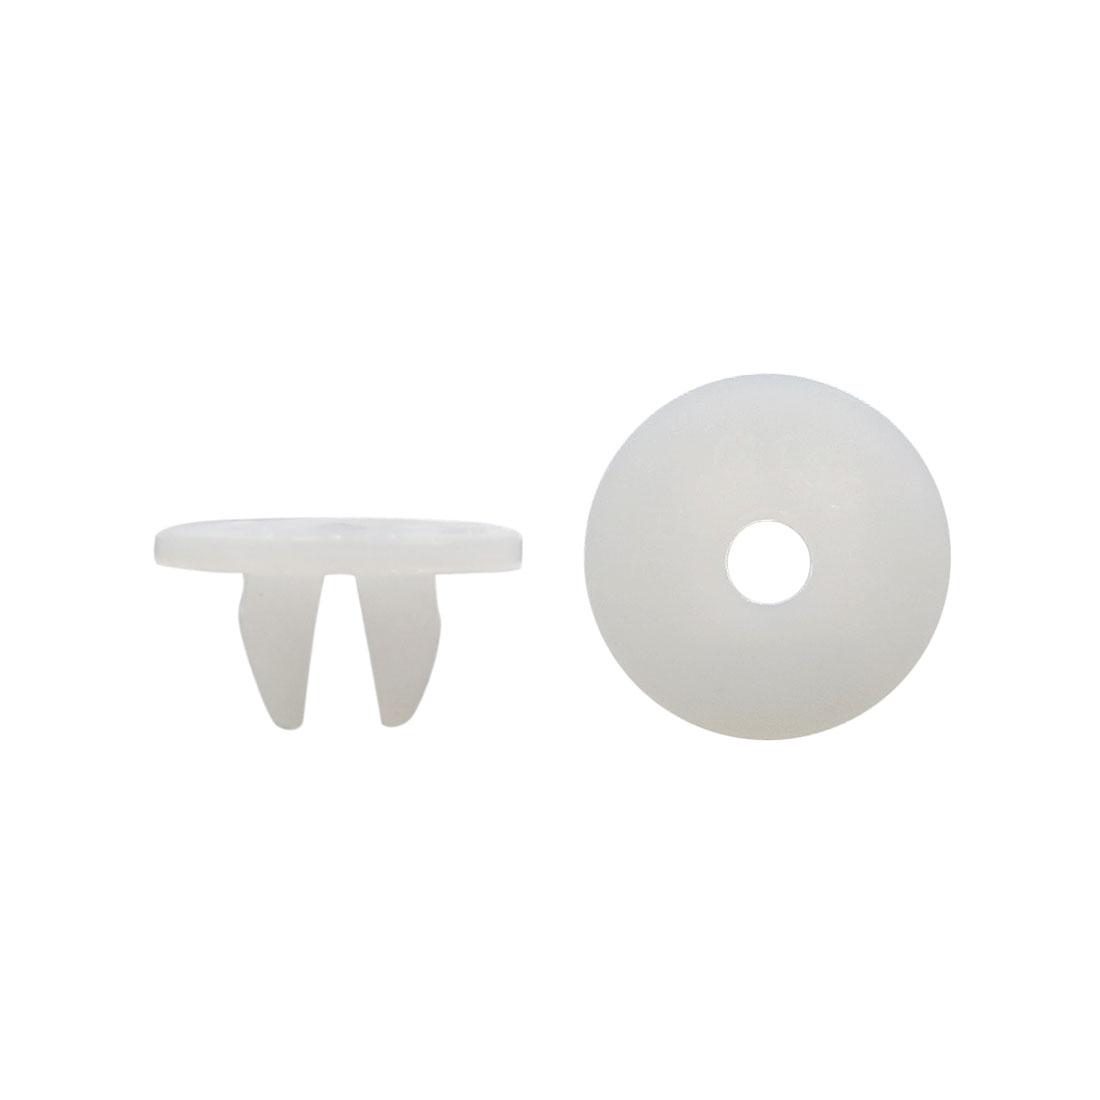 100 Pcs 8mm x 7mm Hole Dia Plastic White Rivets Bumper Door Fastener Clips